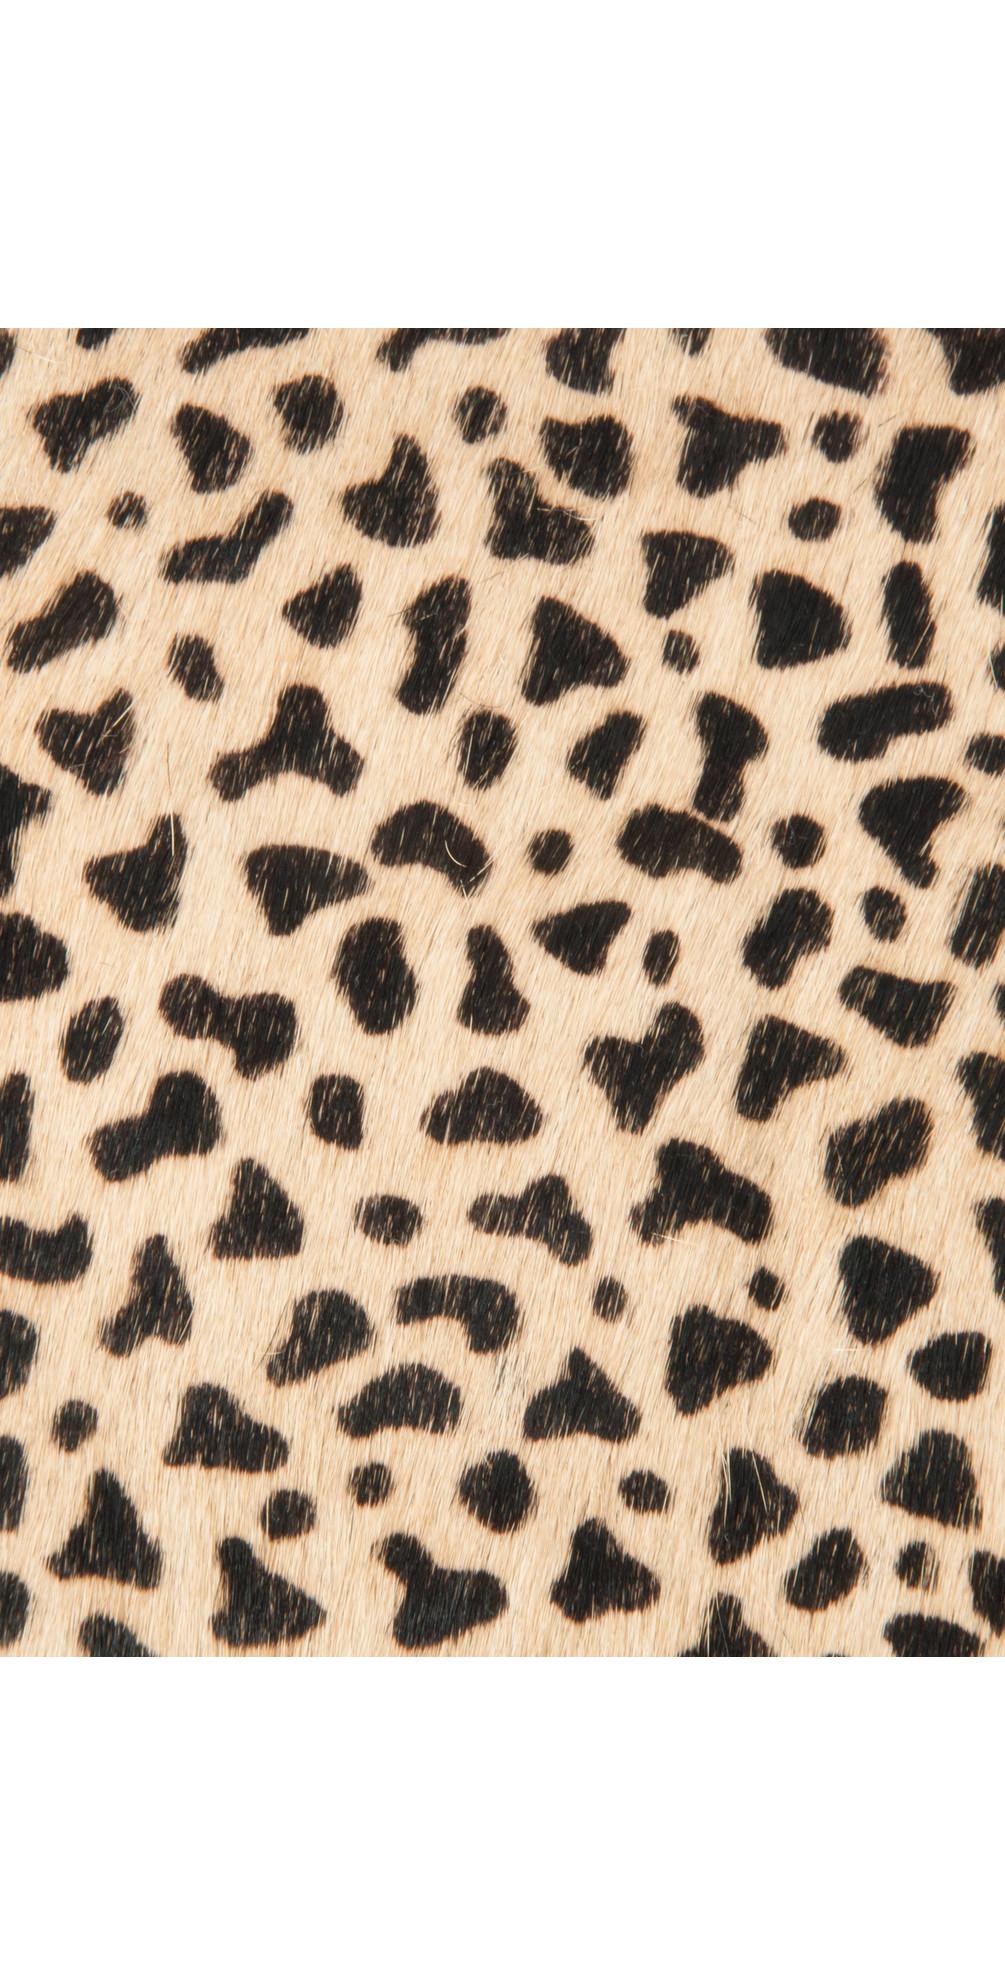 L-Dea Hair Small Bag main image